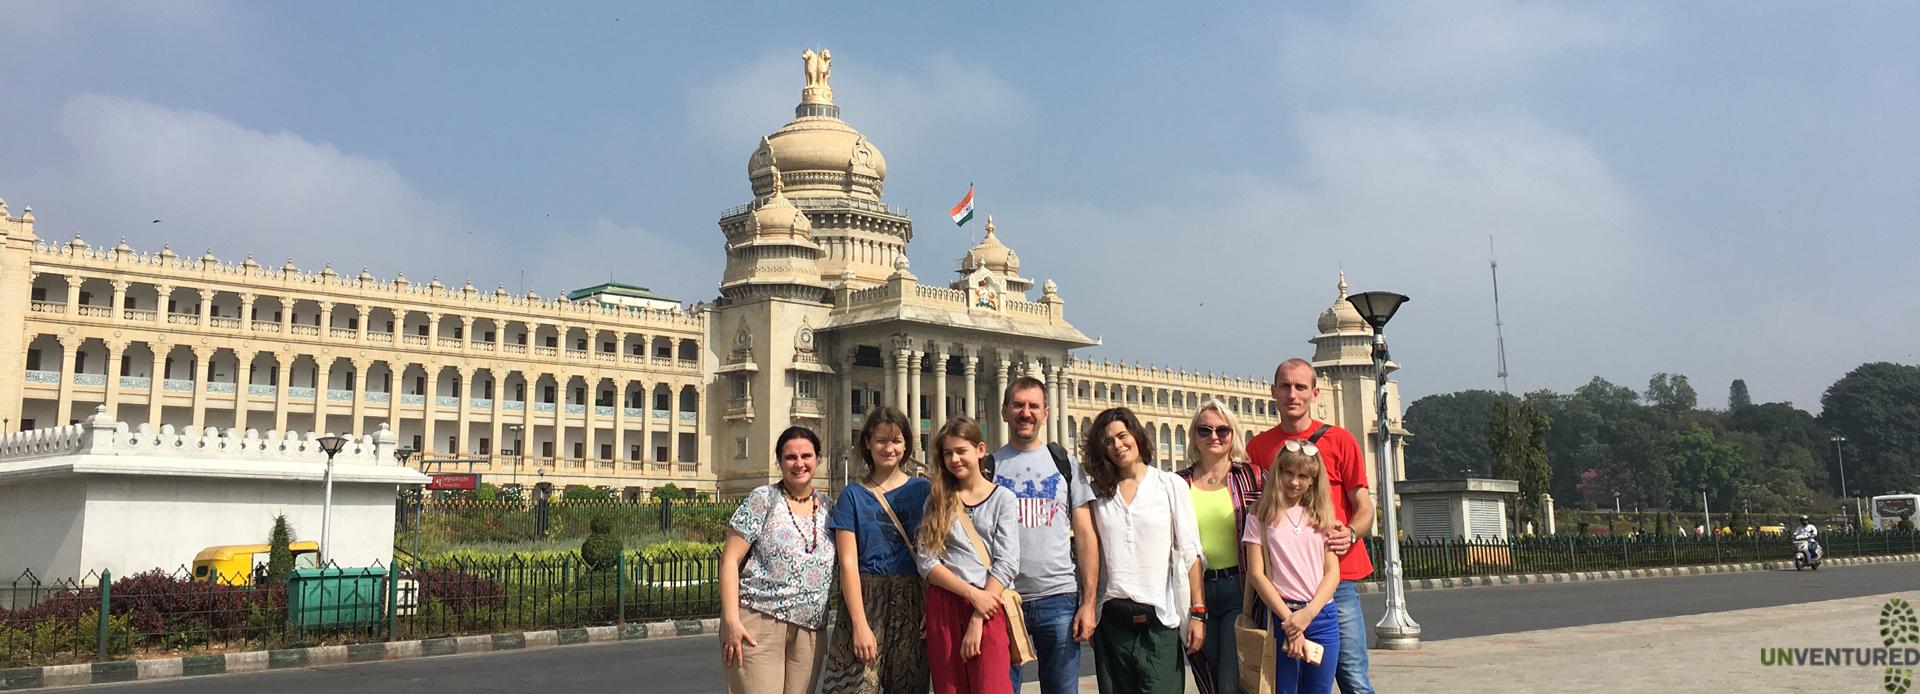 Bengaluru City Tour at Vidhana Soudha